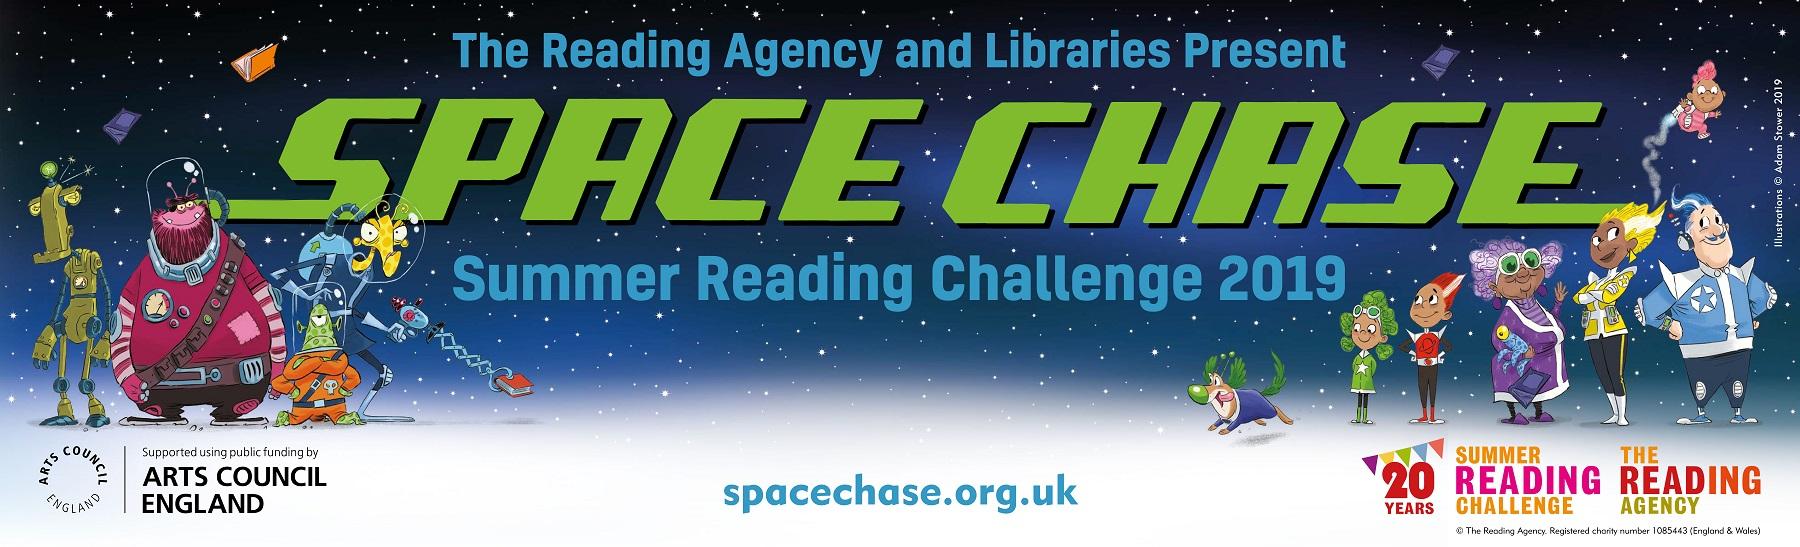 summer reading challenge logo